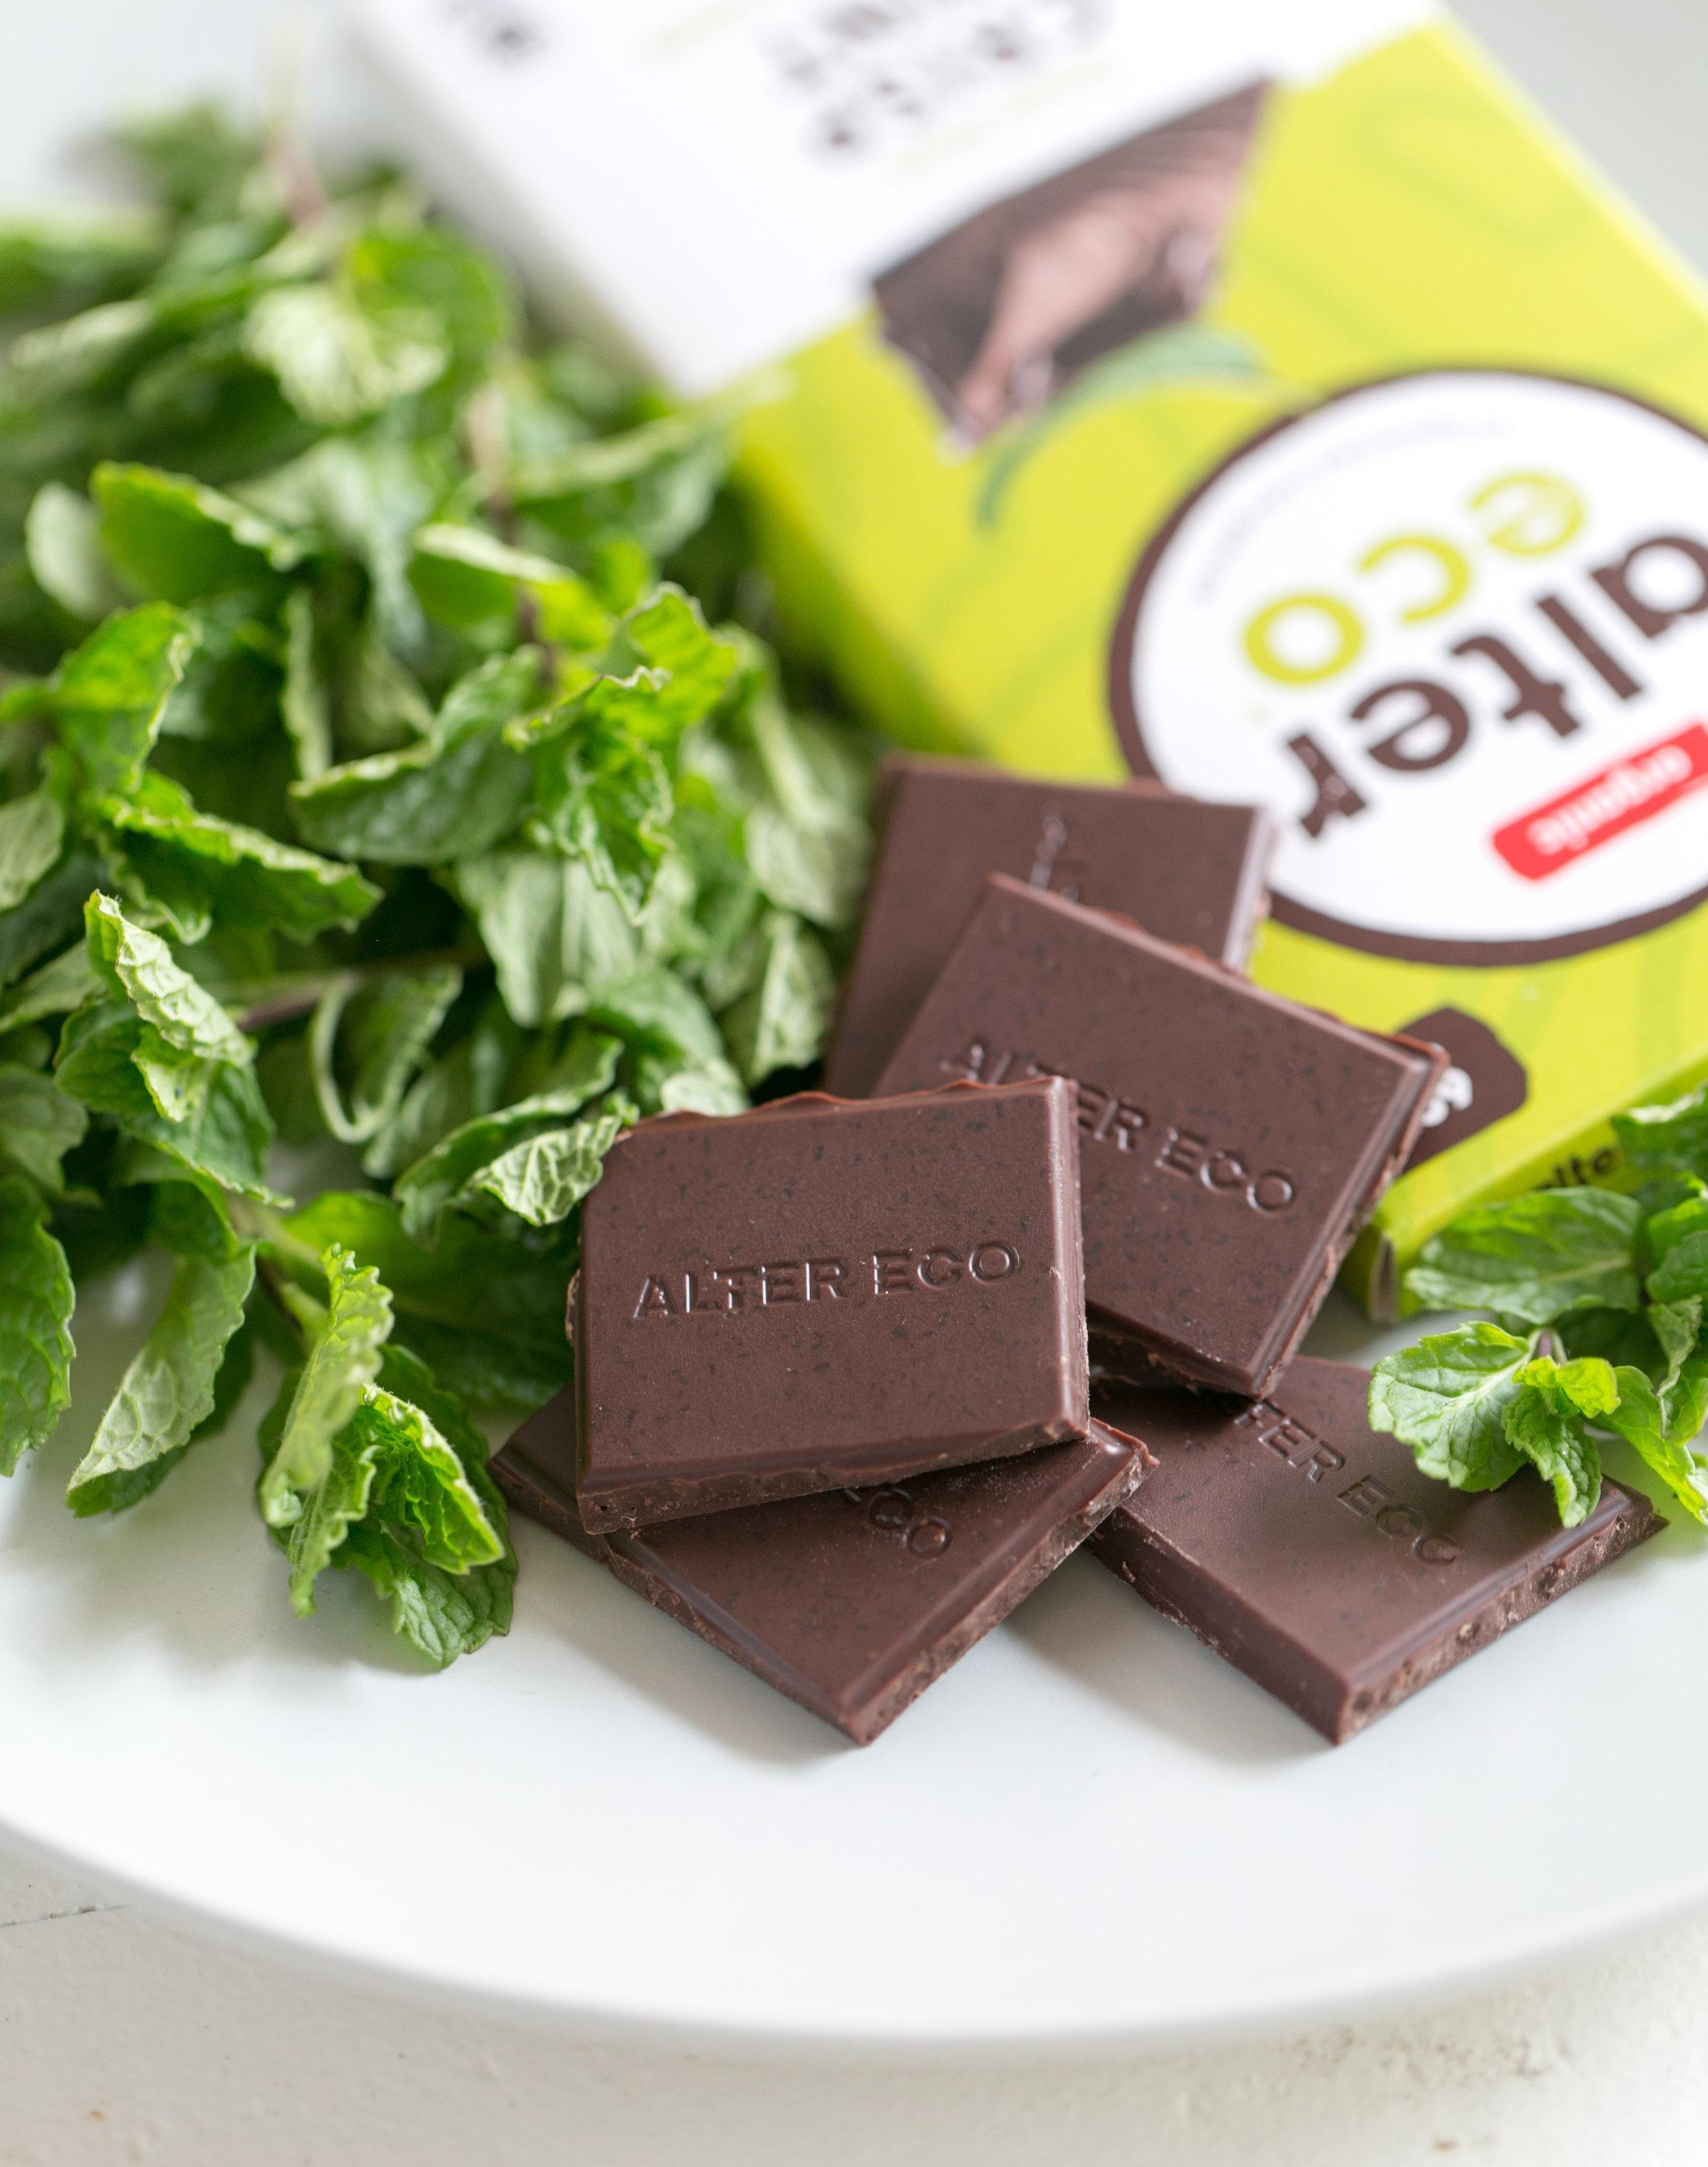 Alter Eco Chocolate mint dark chocolate bar photo by Tory Putnam